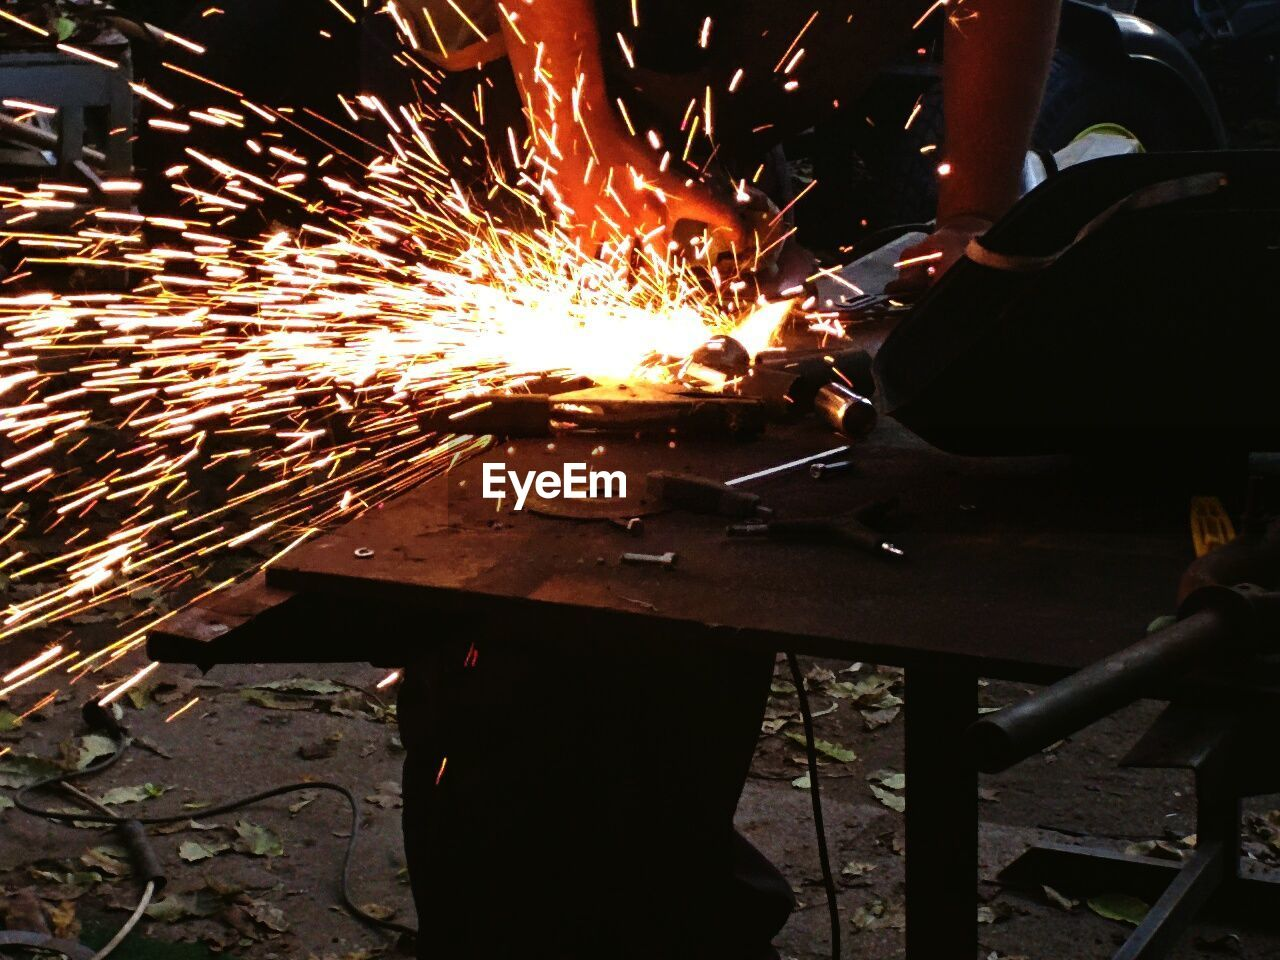 sparks, workshop, working, occupation, metal industry, glowing, heat - temperature, motion, industry, work tool, metal, skill, burning, men, manual worker, grinder, indoors, one person, expertise, flame, real people, welder, factory, people